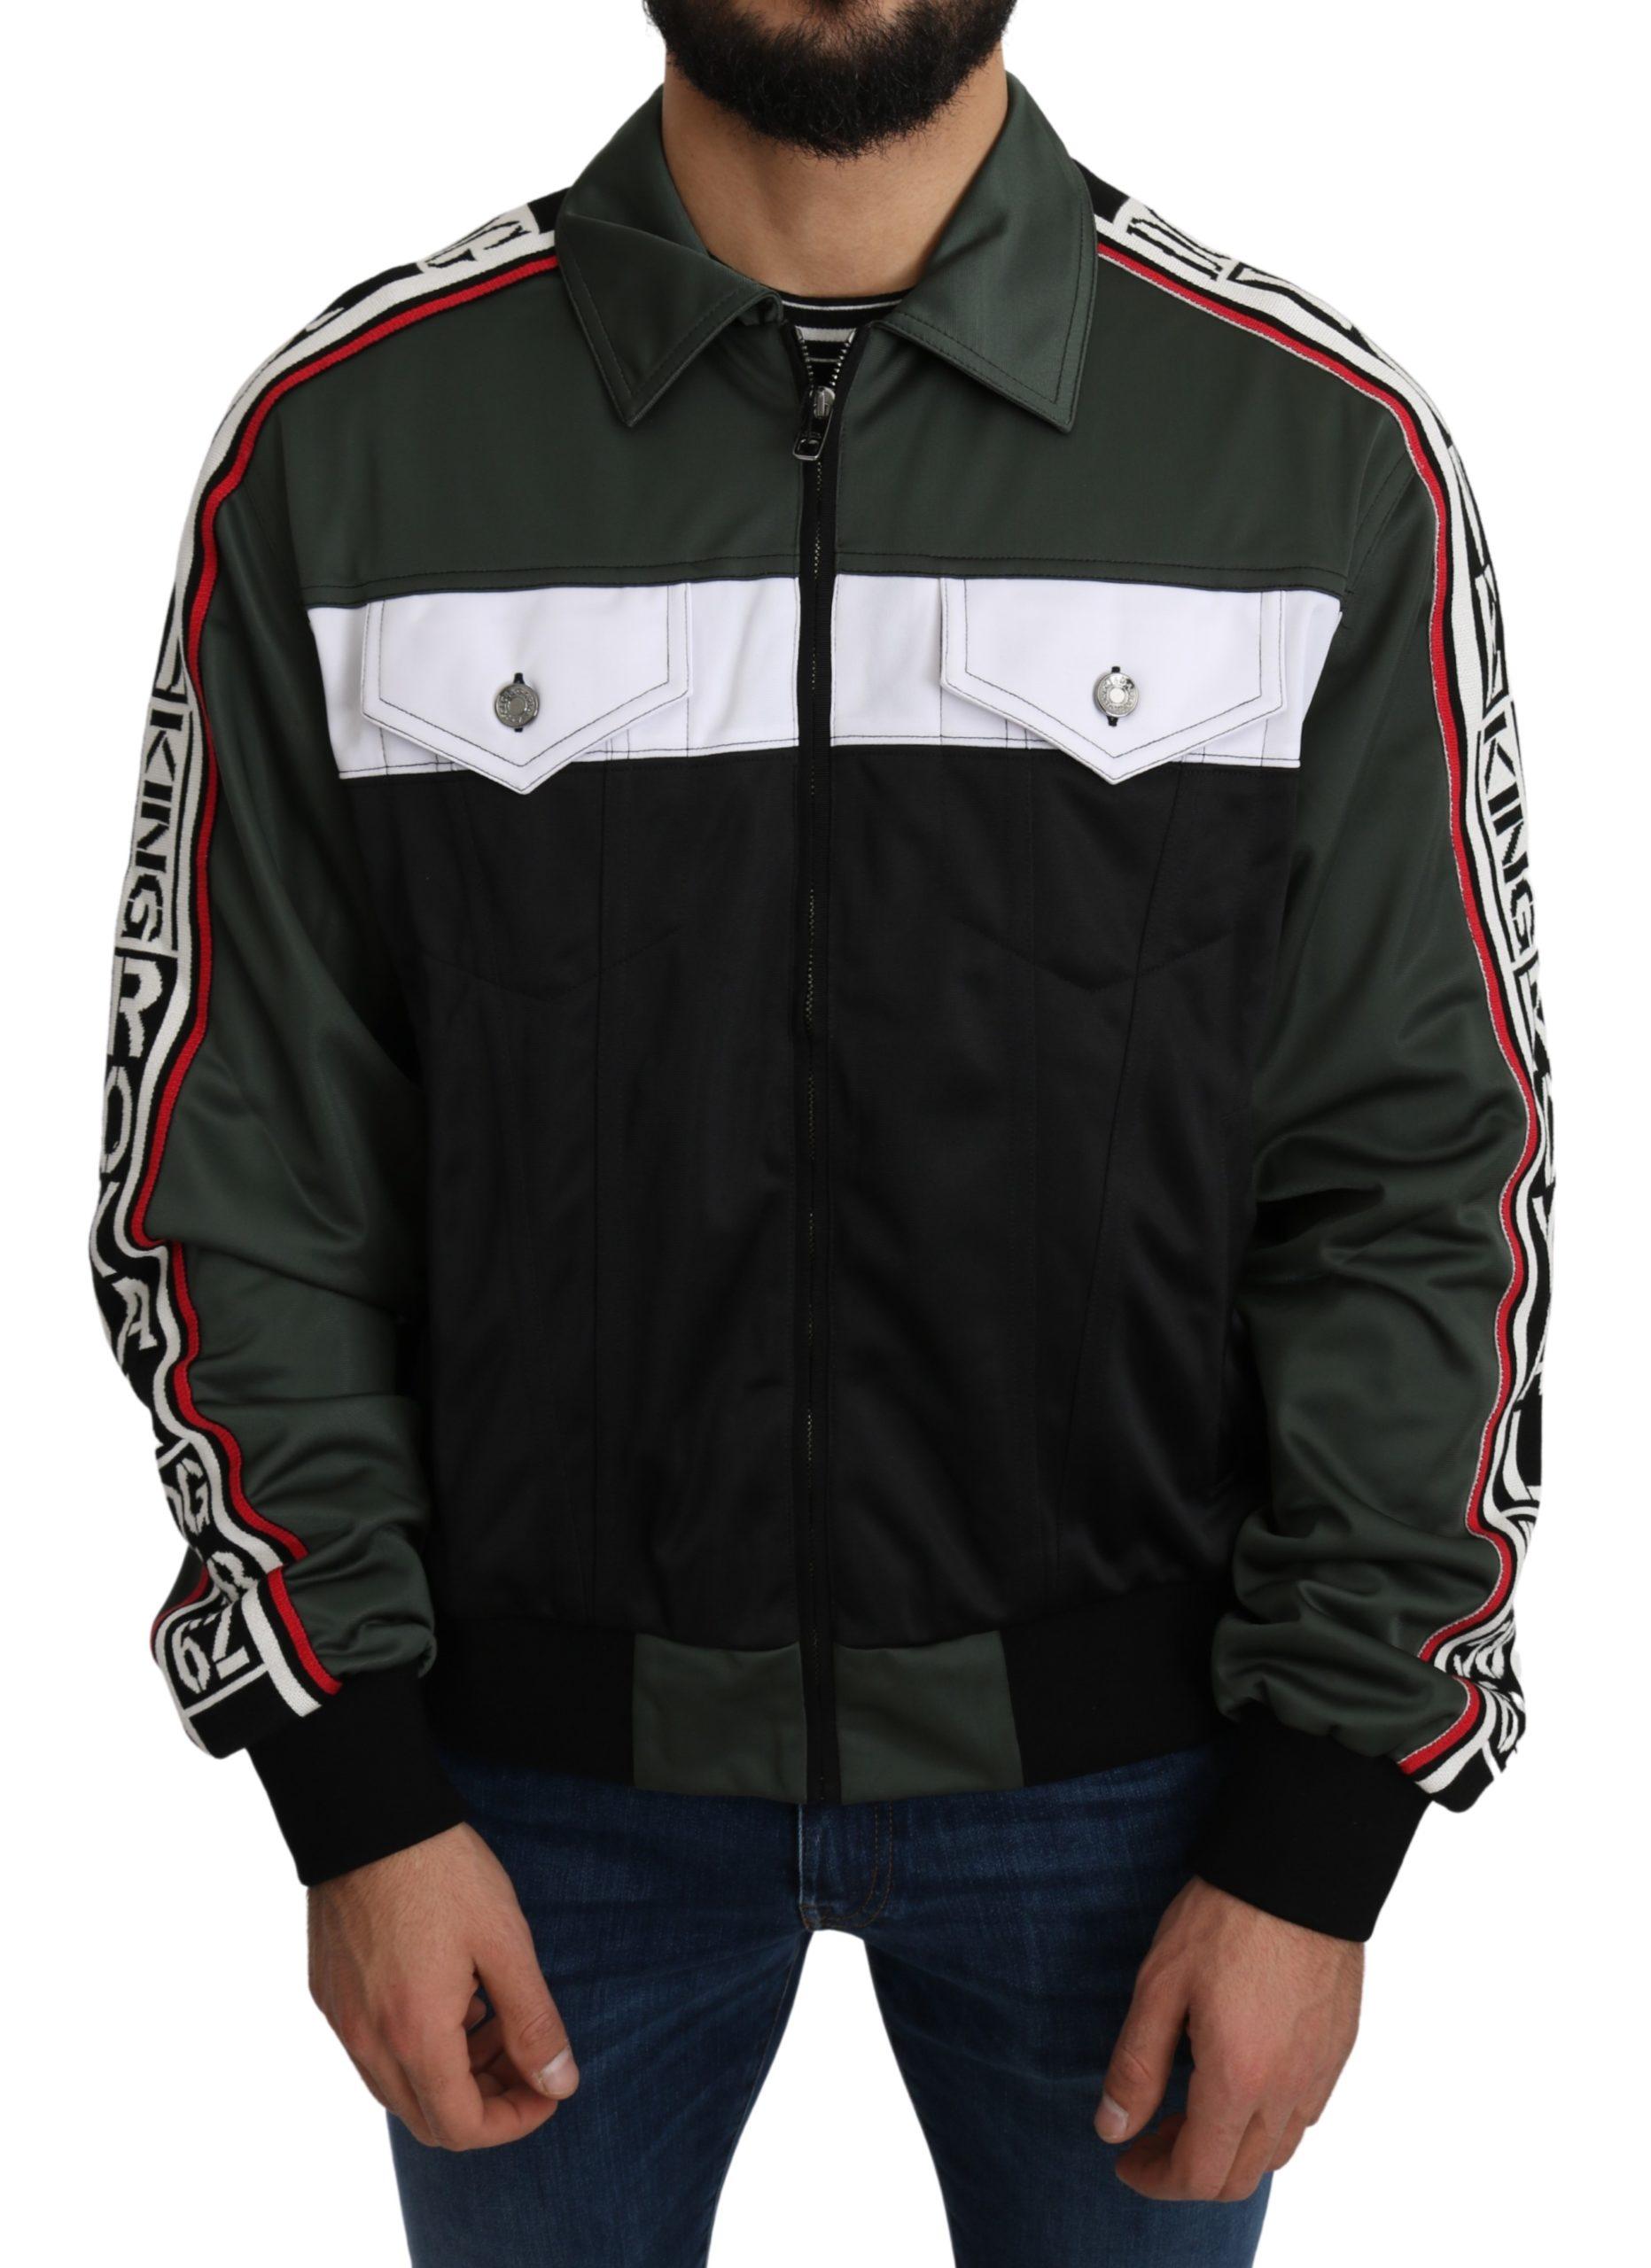 Dolce & Gabbana Men's DG KING Logo Stripe Jacket Green JKT2645 - IT50 | L